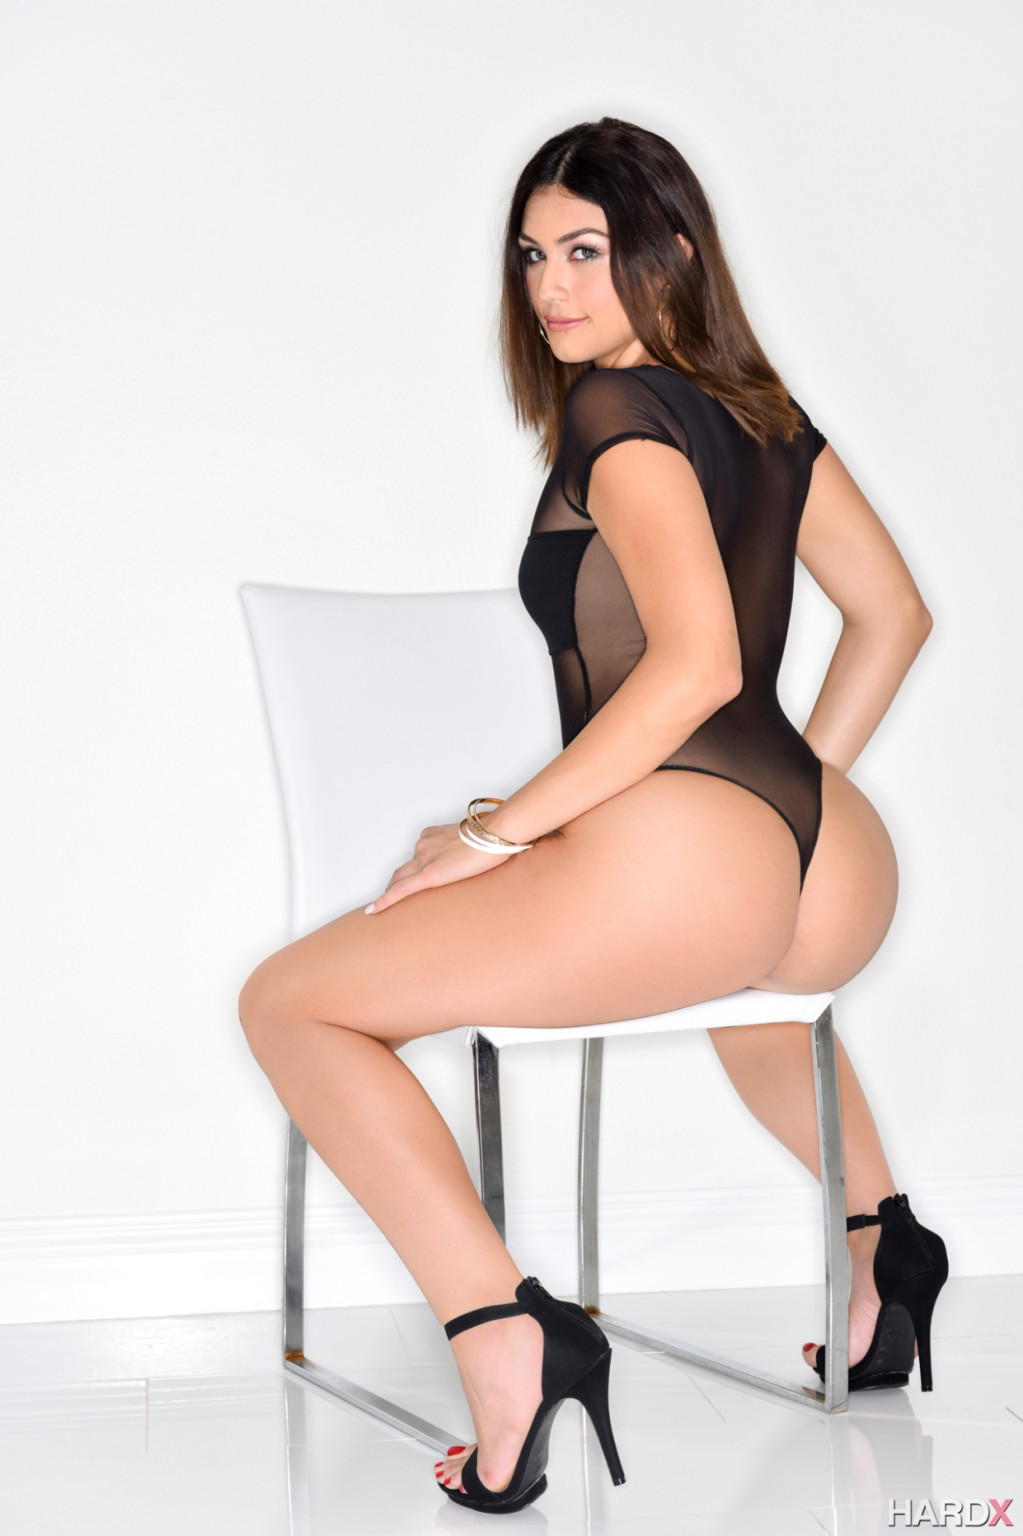 Kylie Sinner - На каблуках - Галерея № 3484853